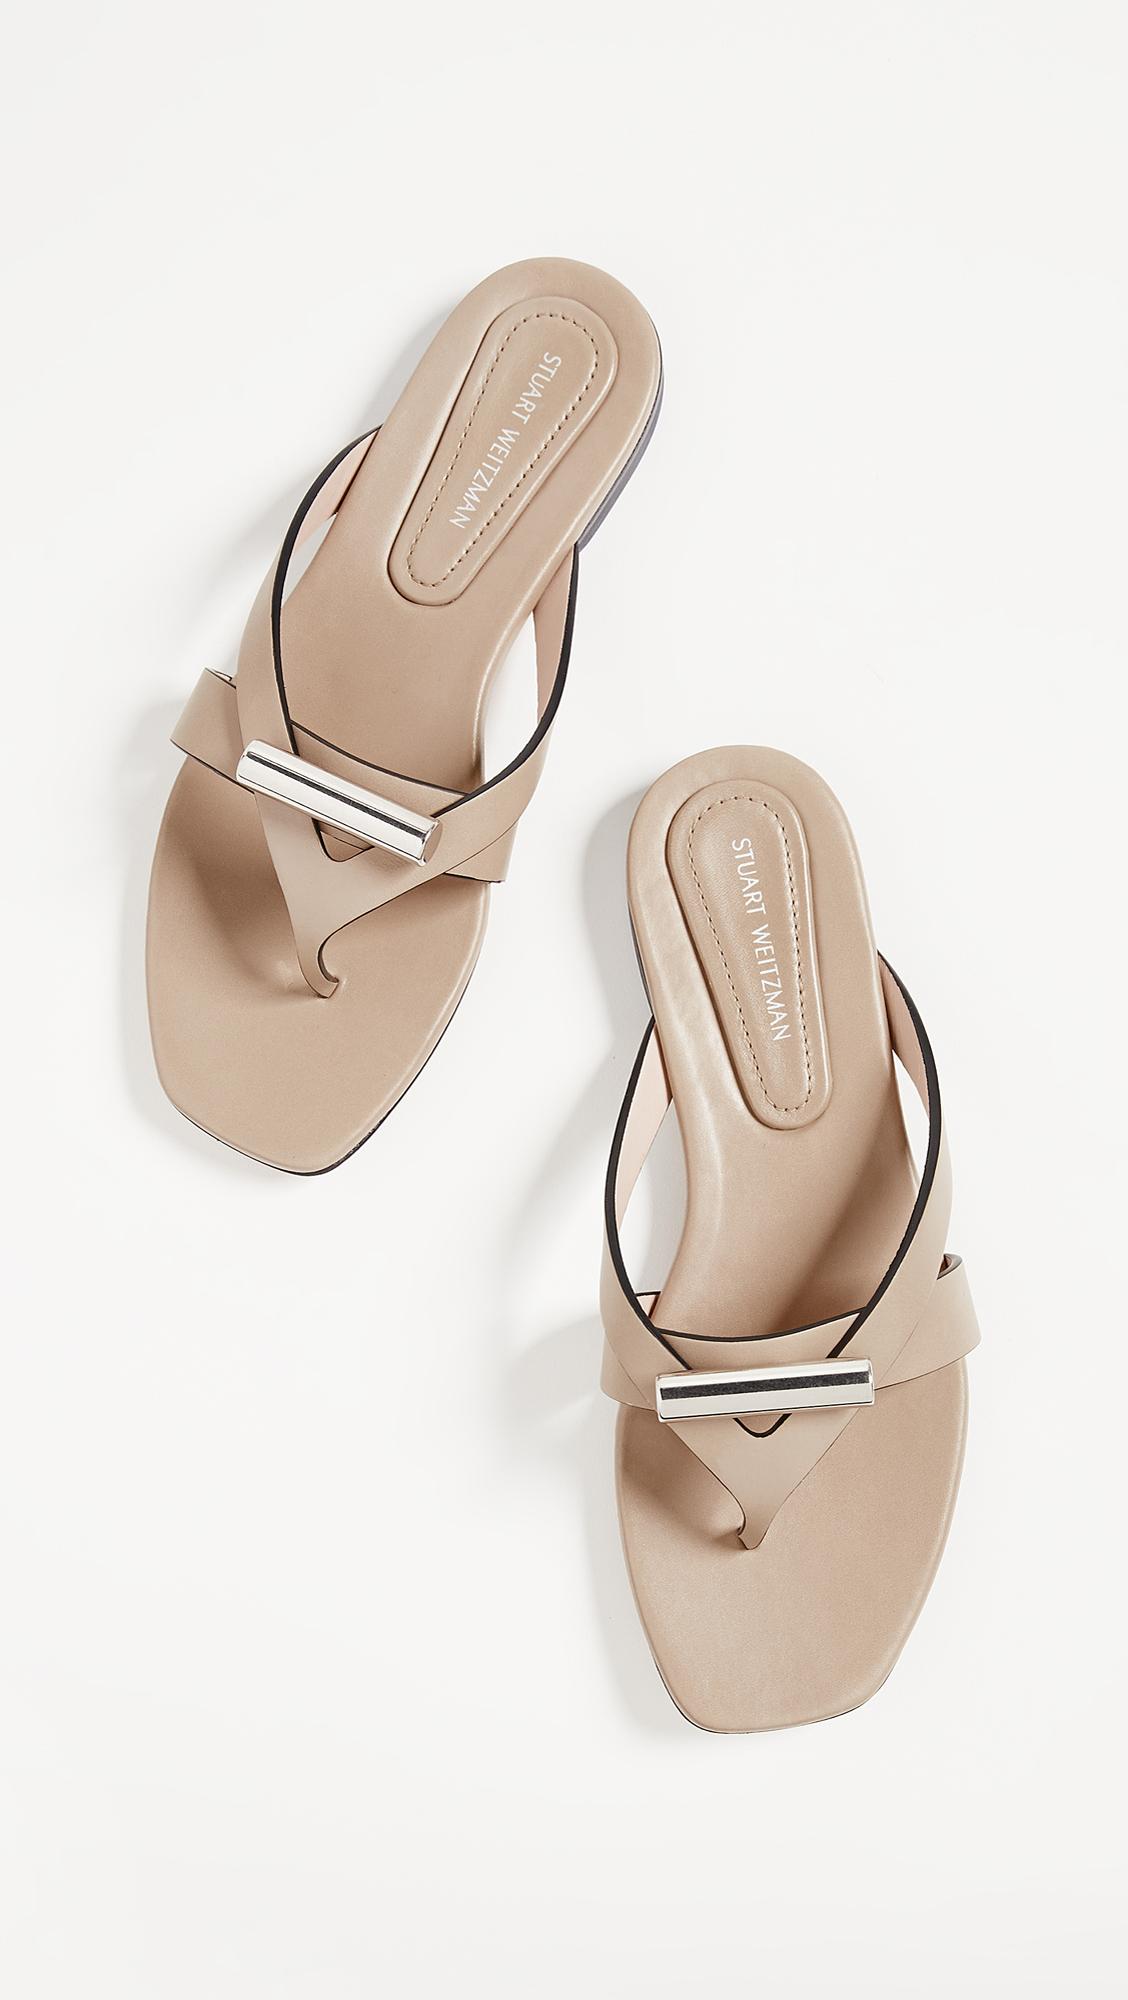 c1a5da242b6 Stuart Weitzman Arro Thong Sandals